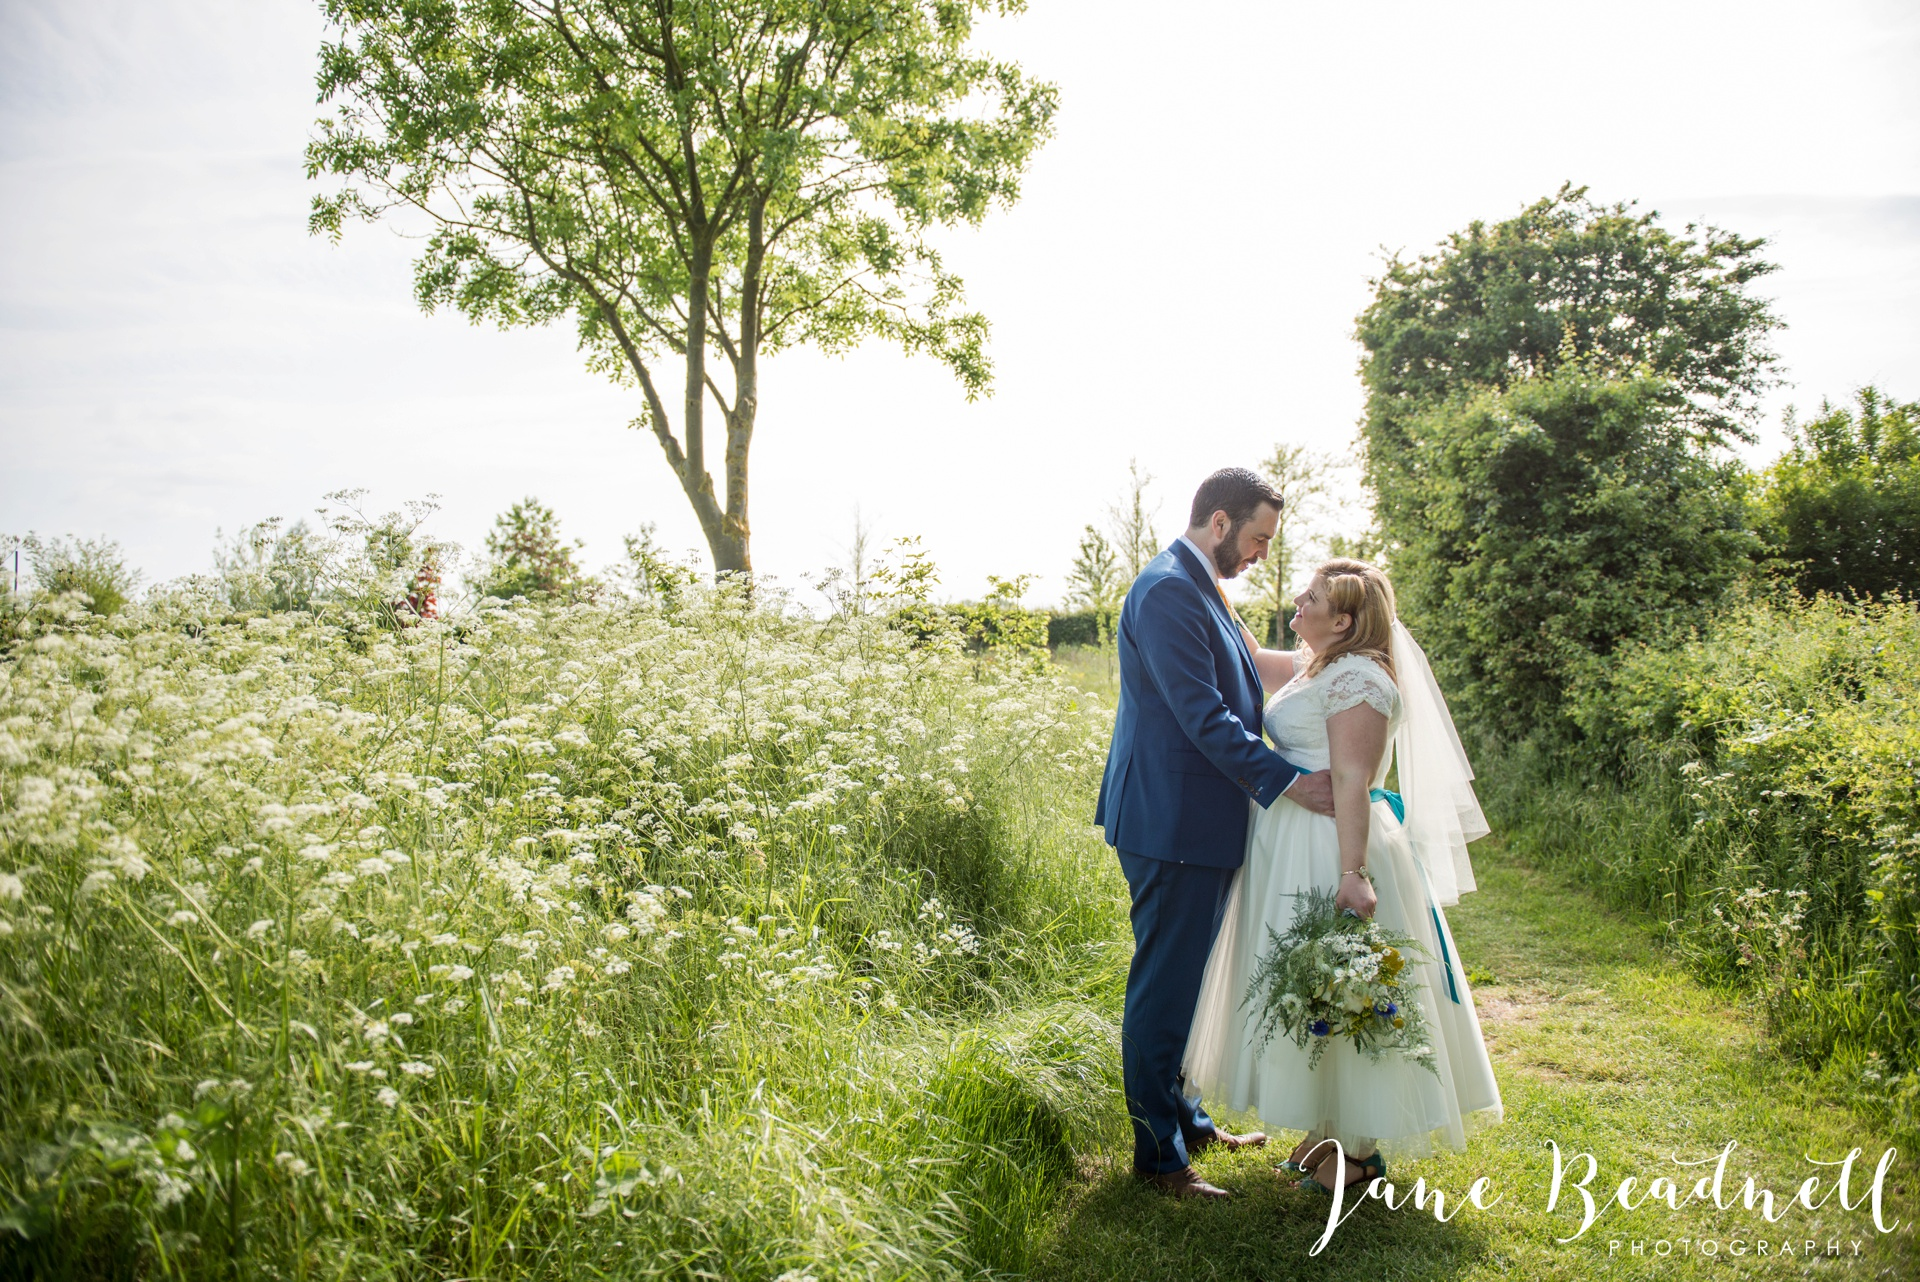 South Farm Wedding photography Hertfordshire by Jane Beadnell Photography fine art wedding photographer_0130